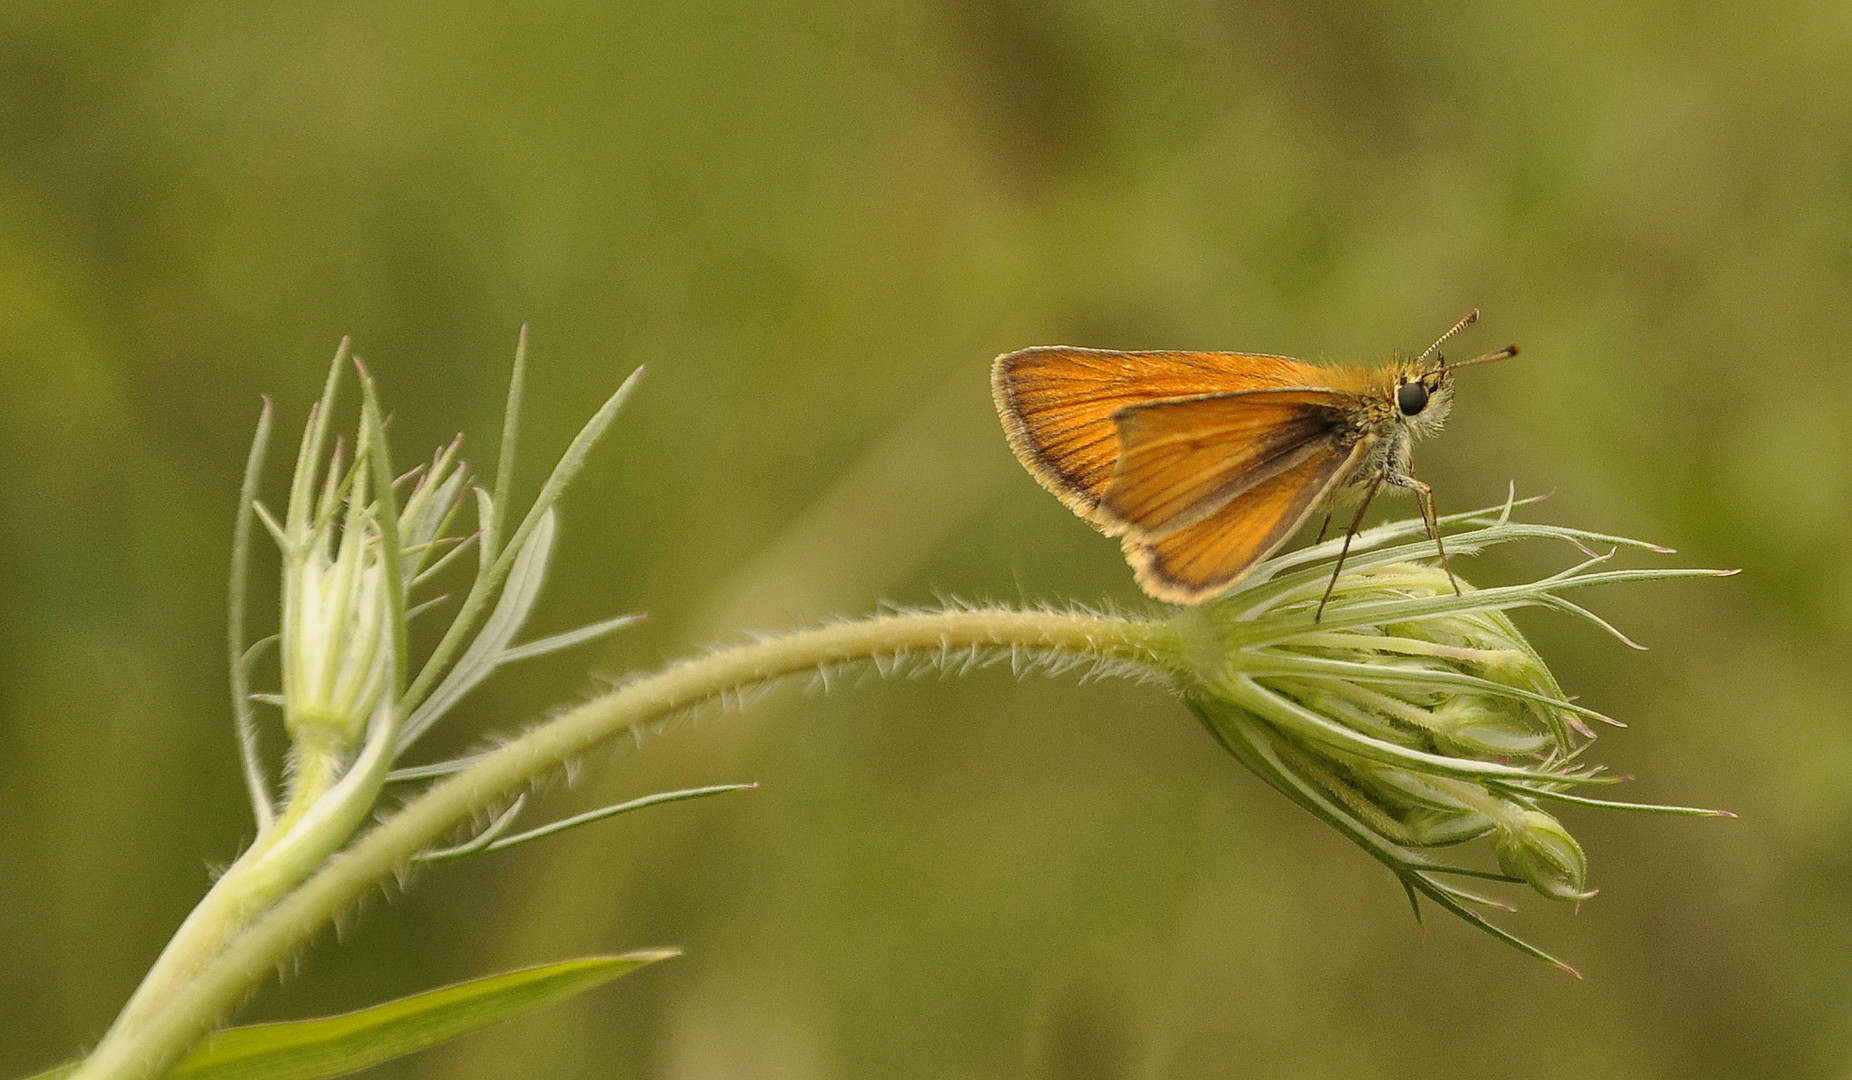 Motte oder Schmetterling?